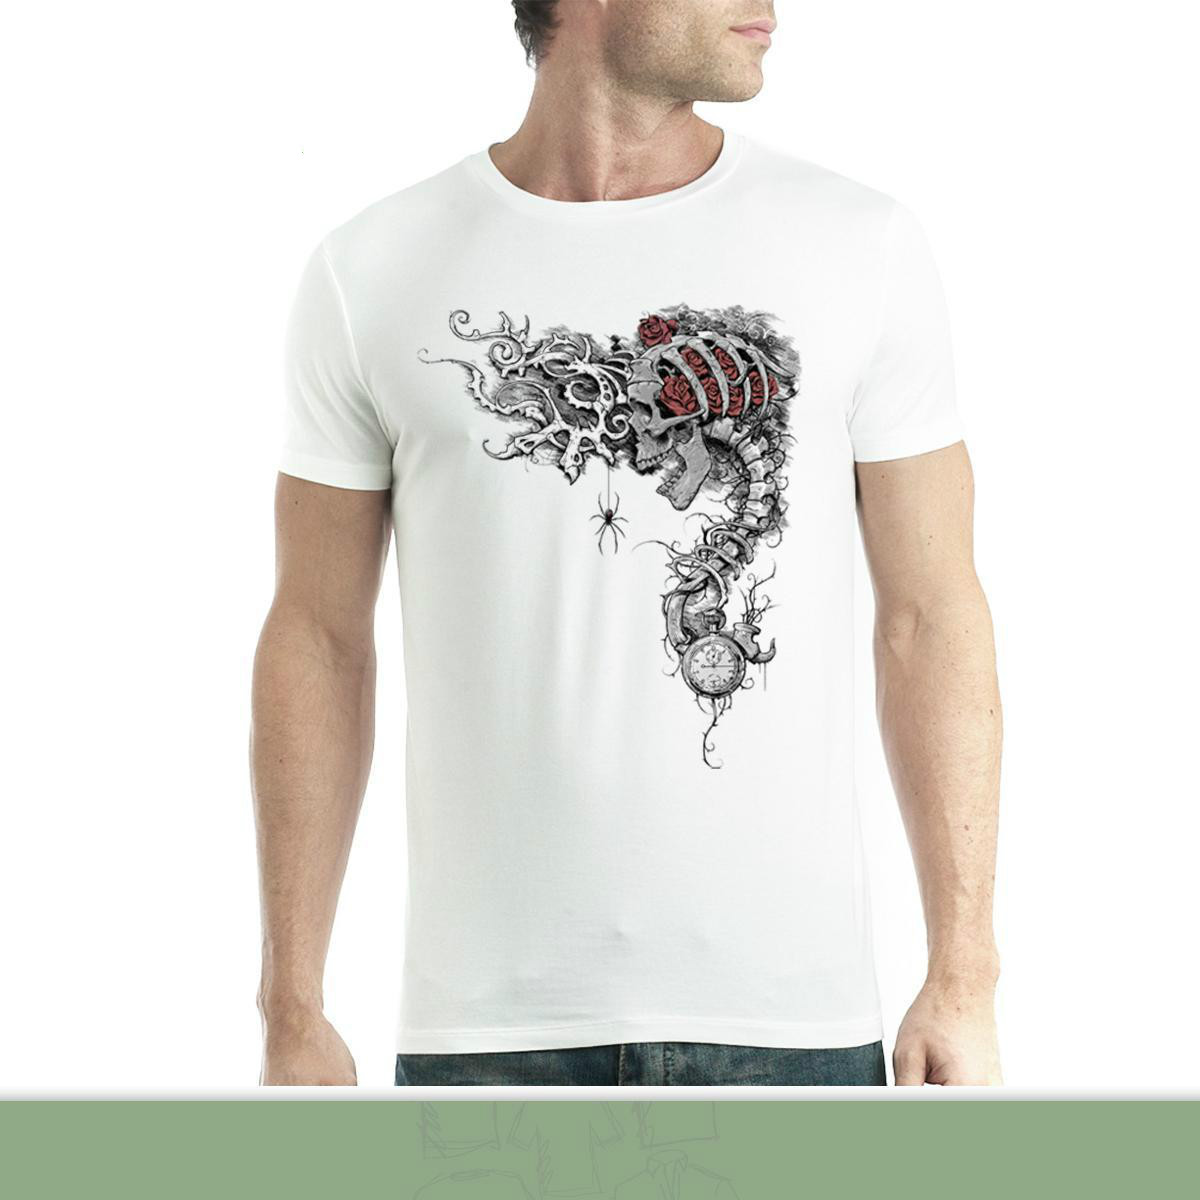 Gardien de Temps Des Roses Homme T-shirt XS-5XL Print T-Shirt Summer Casual top tee High Quality Personality